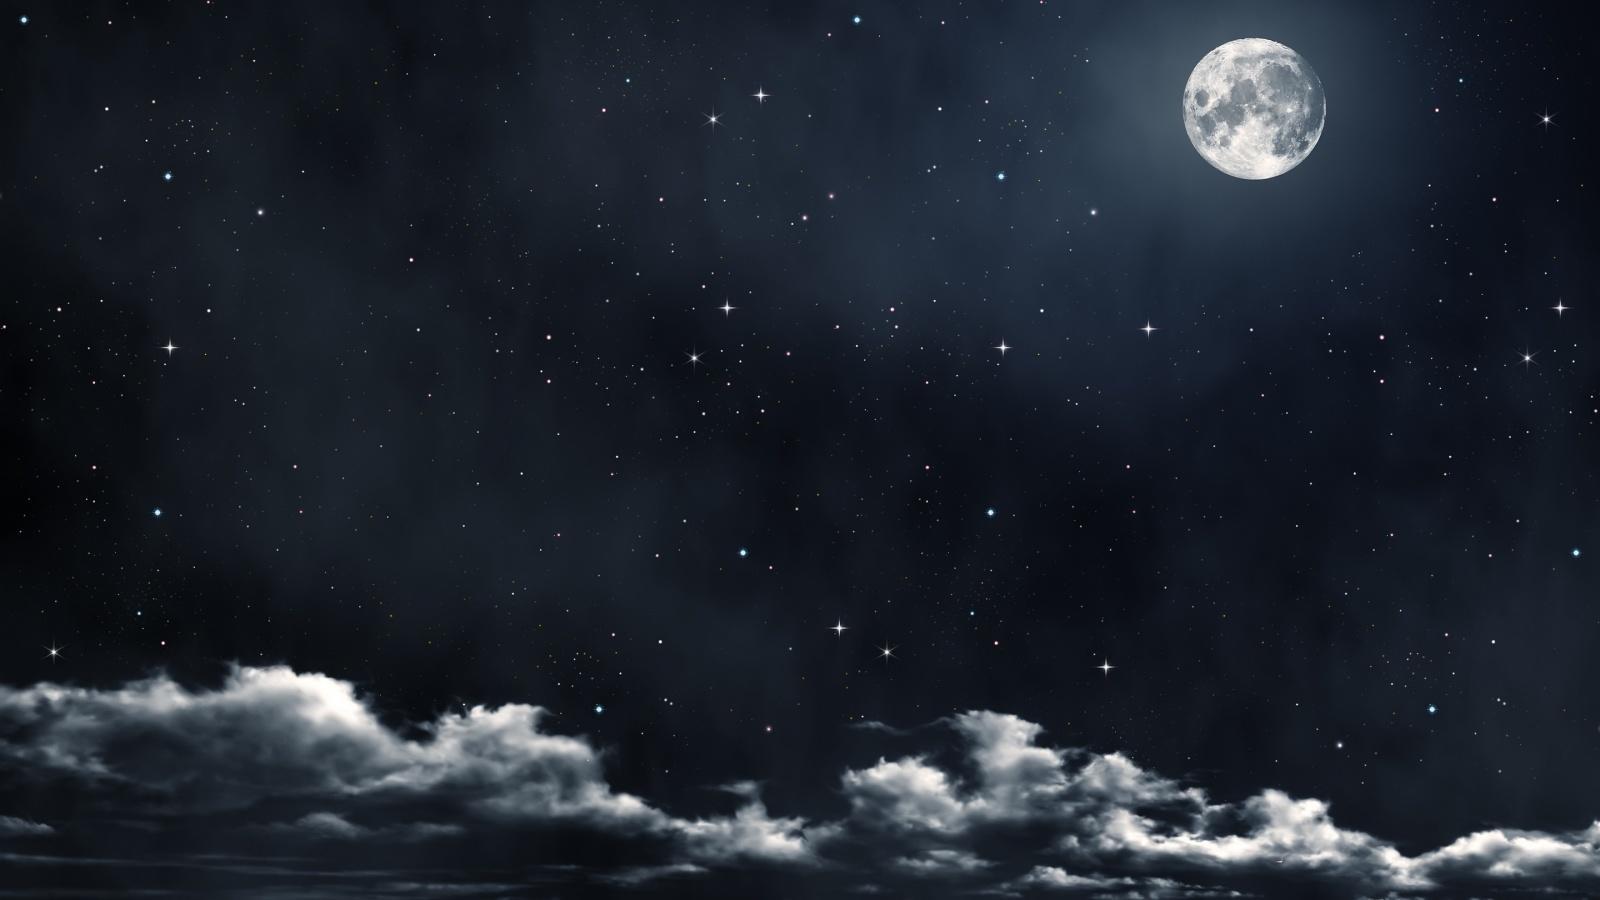 Возможно, завтра будут звёзды